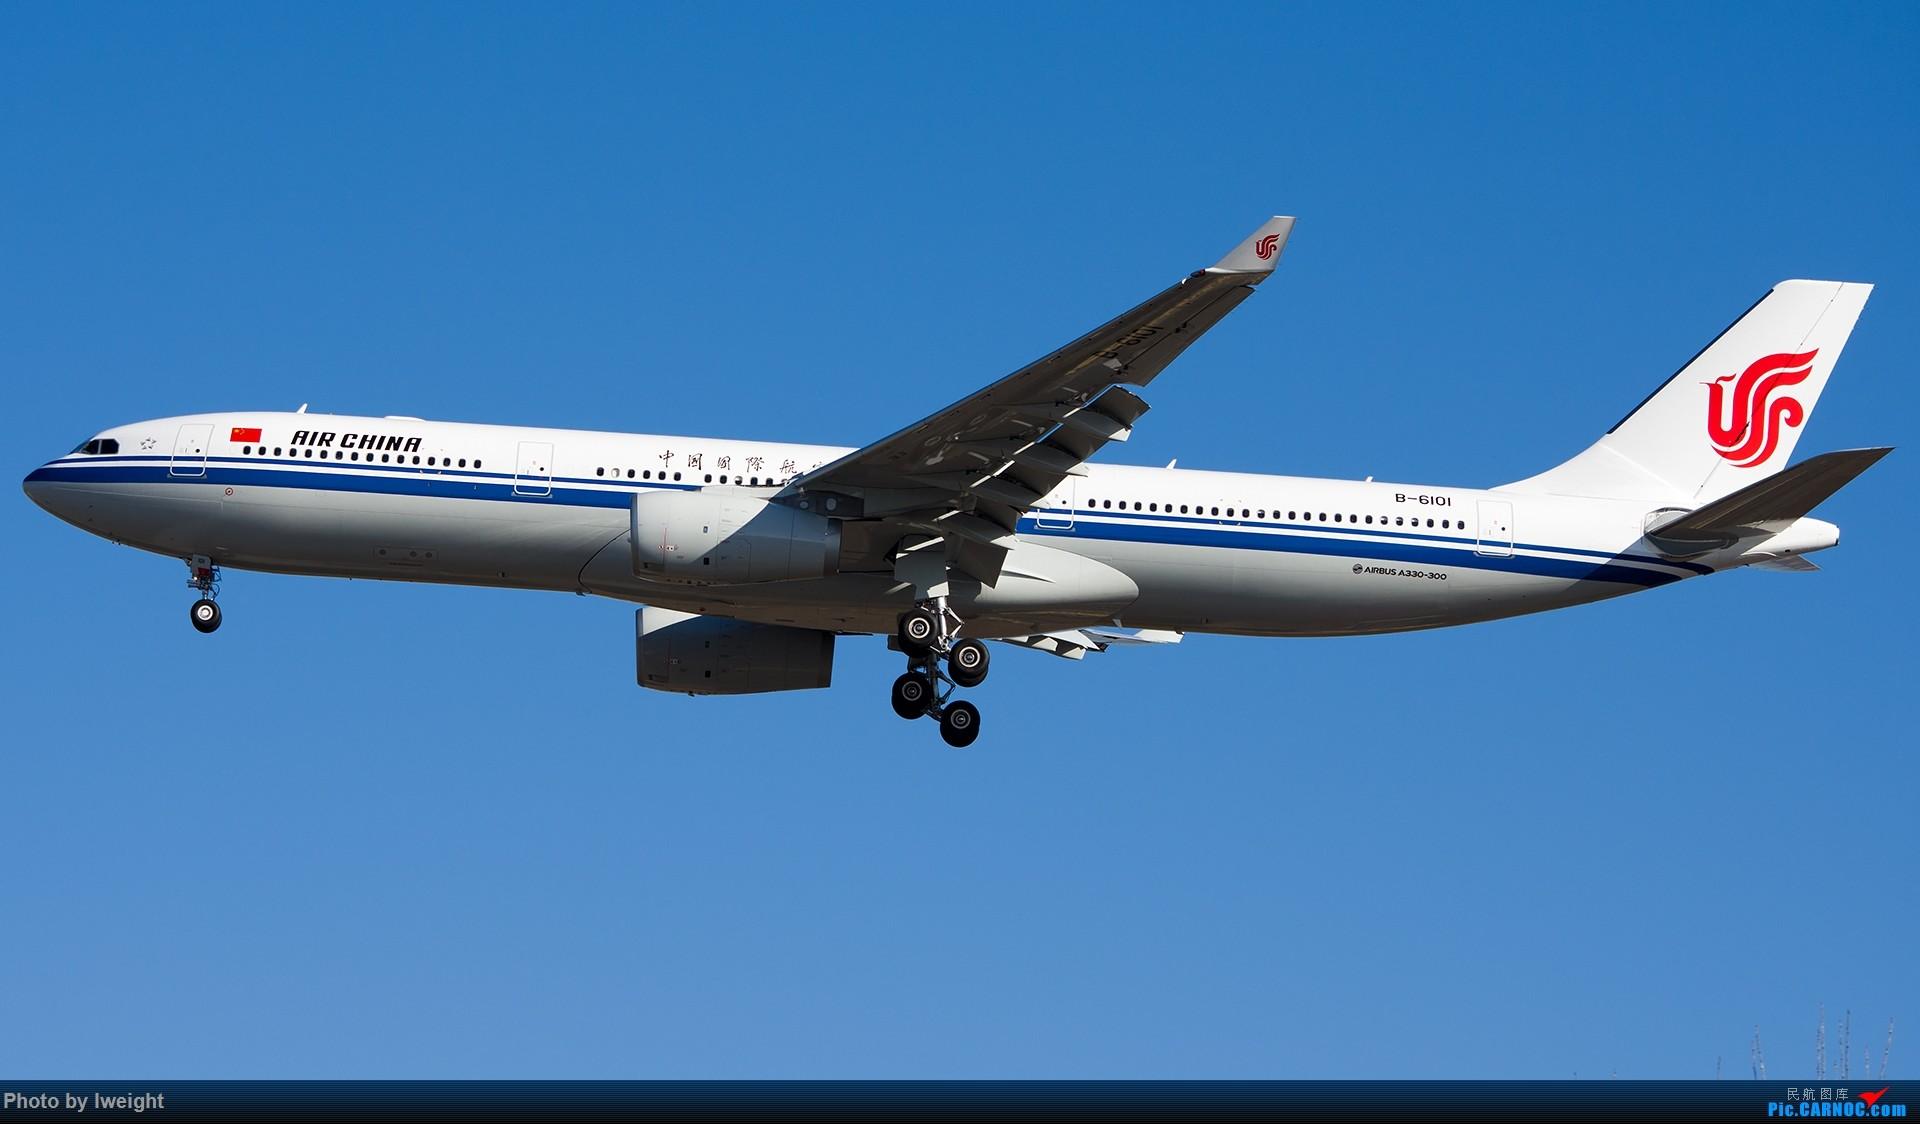 Re:[原创]终于在12月的北京等到了一个晴天的周末,出来拍拍飞机【2015-12-5】 AIRBUS A330-300 B-6101 中国北京首都国际机场